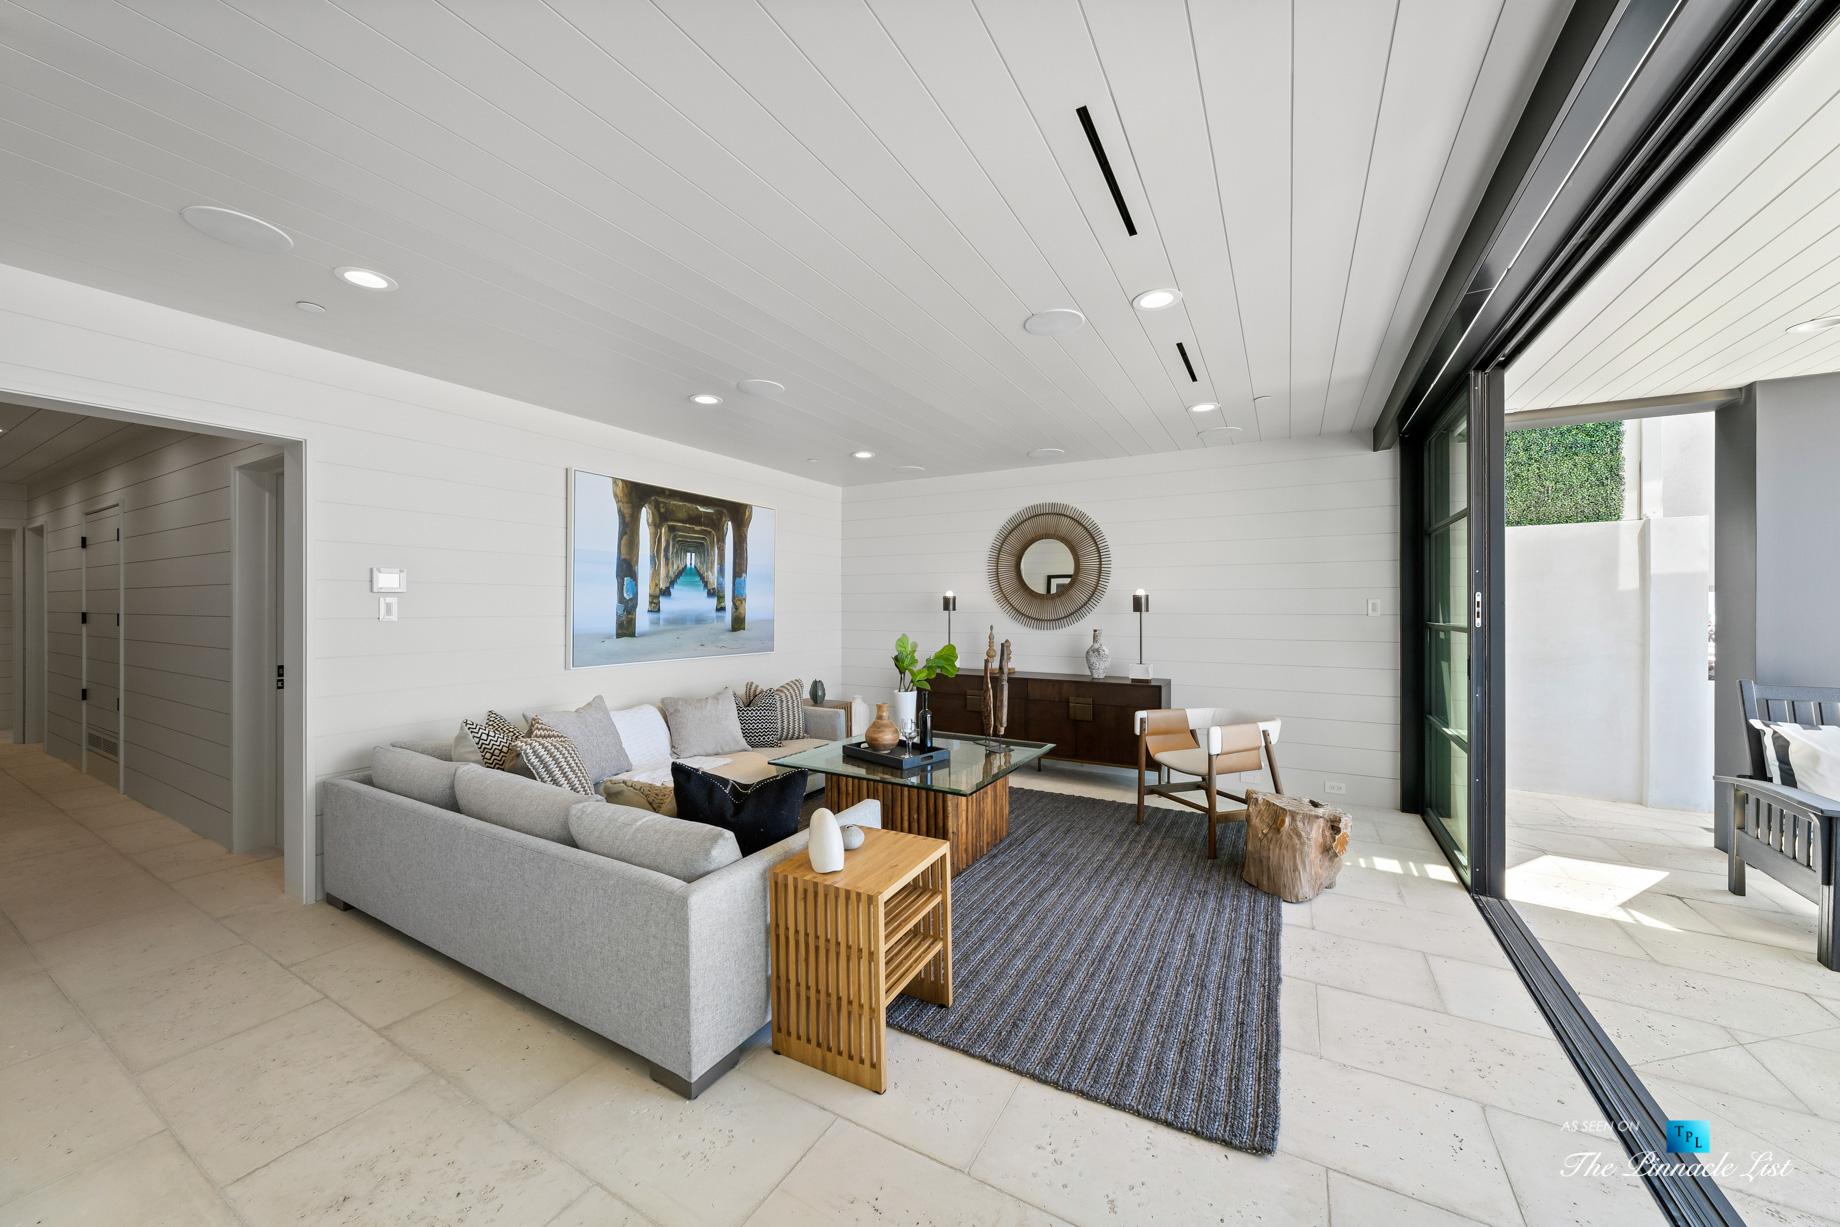 508 The Strand, Manhattan Beach, CA, USA – Lower Level Living Room – Luxury Real Estate – Oceanfront Home